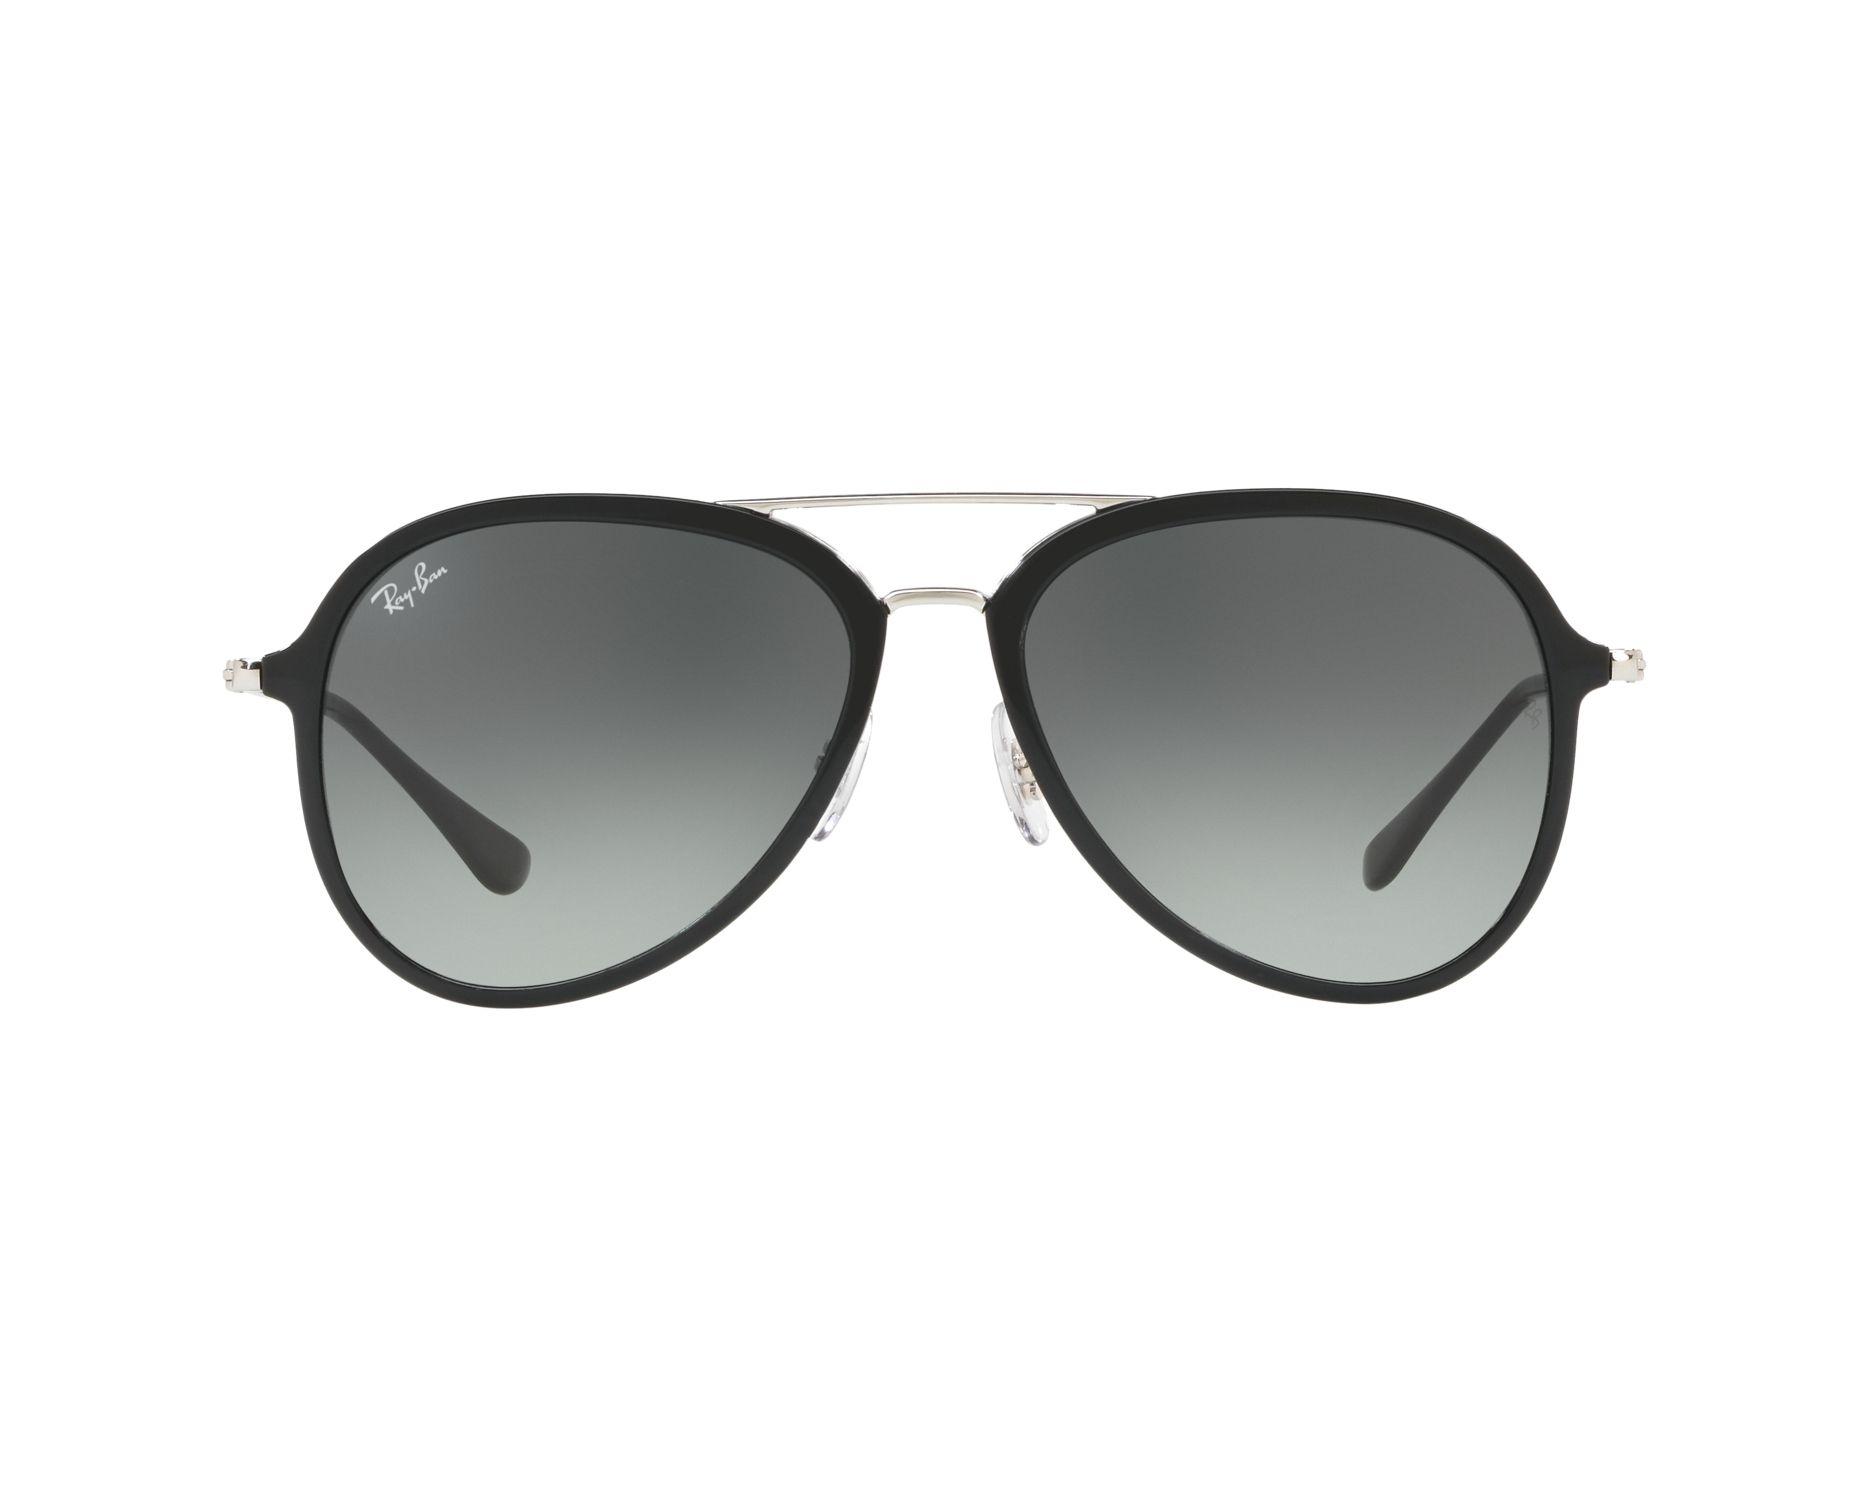 RAY BAN RAY-BAN Sonnenbrille » RB4298«, schwarz, 601/71 - schwarz/grau